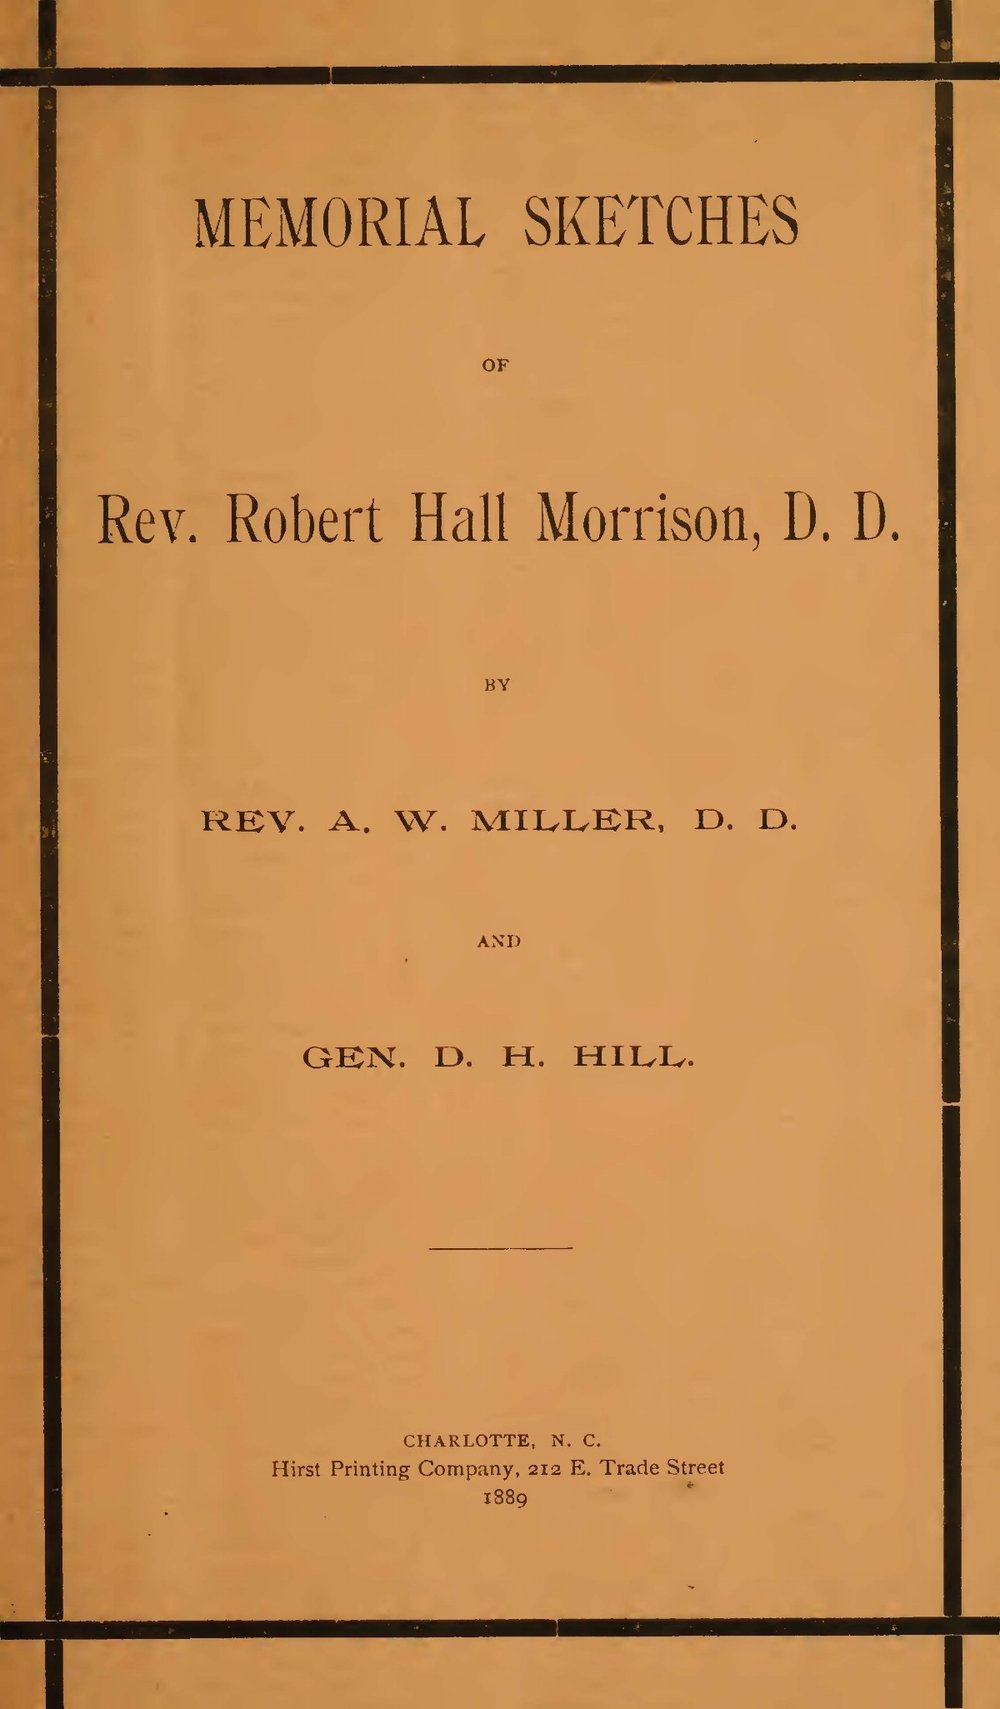 Miller, Arnold W., Memorial Sketches of Rev. Robert Hall Morrison, D.D. Title Page.jpg